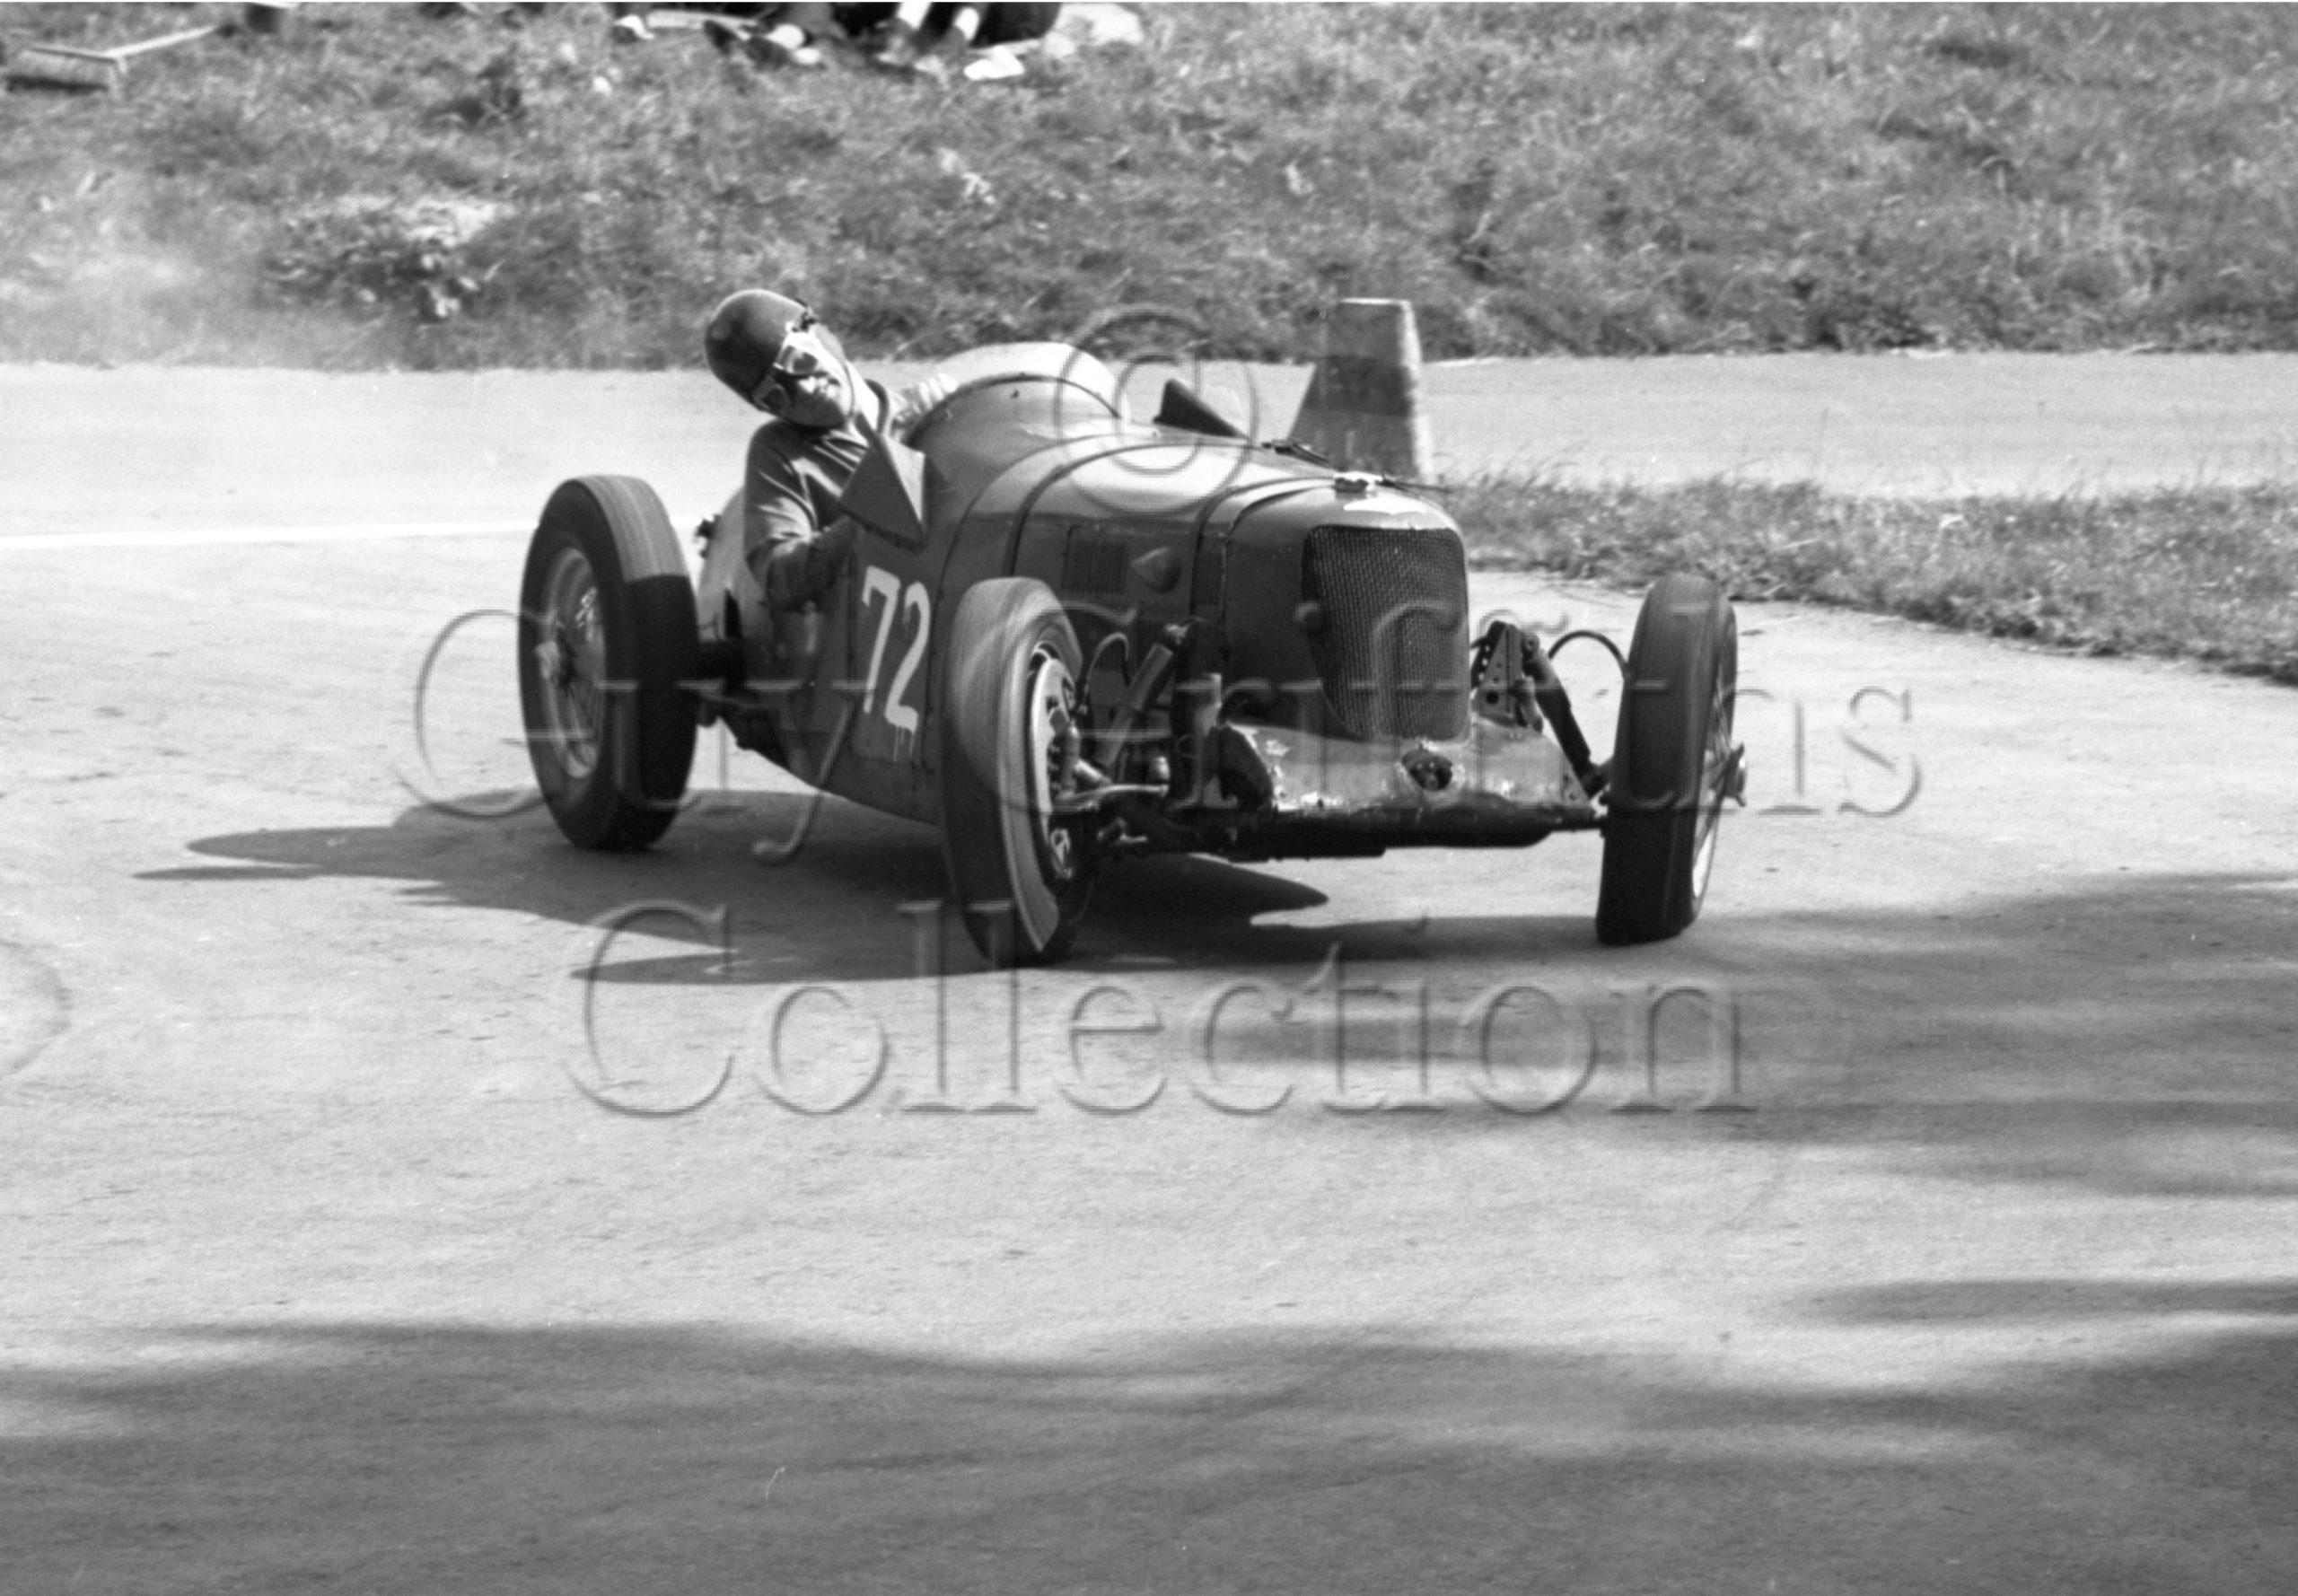 77-301–P-Binns–Riley–Prescott–18-08-1963.jpg - Guy Griffiths Collection